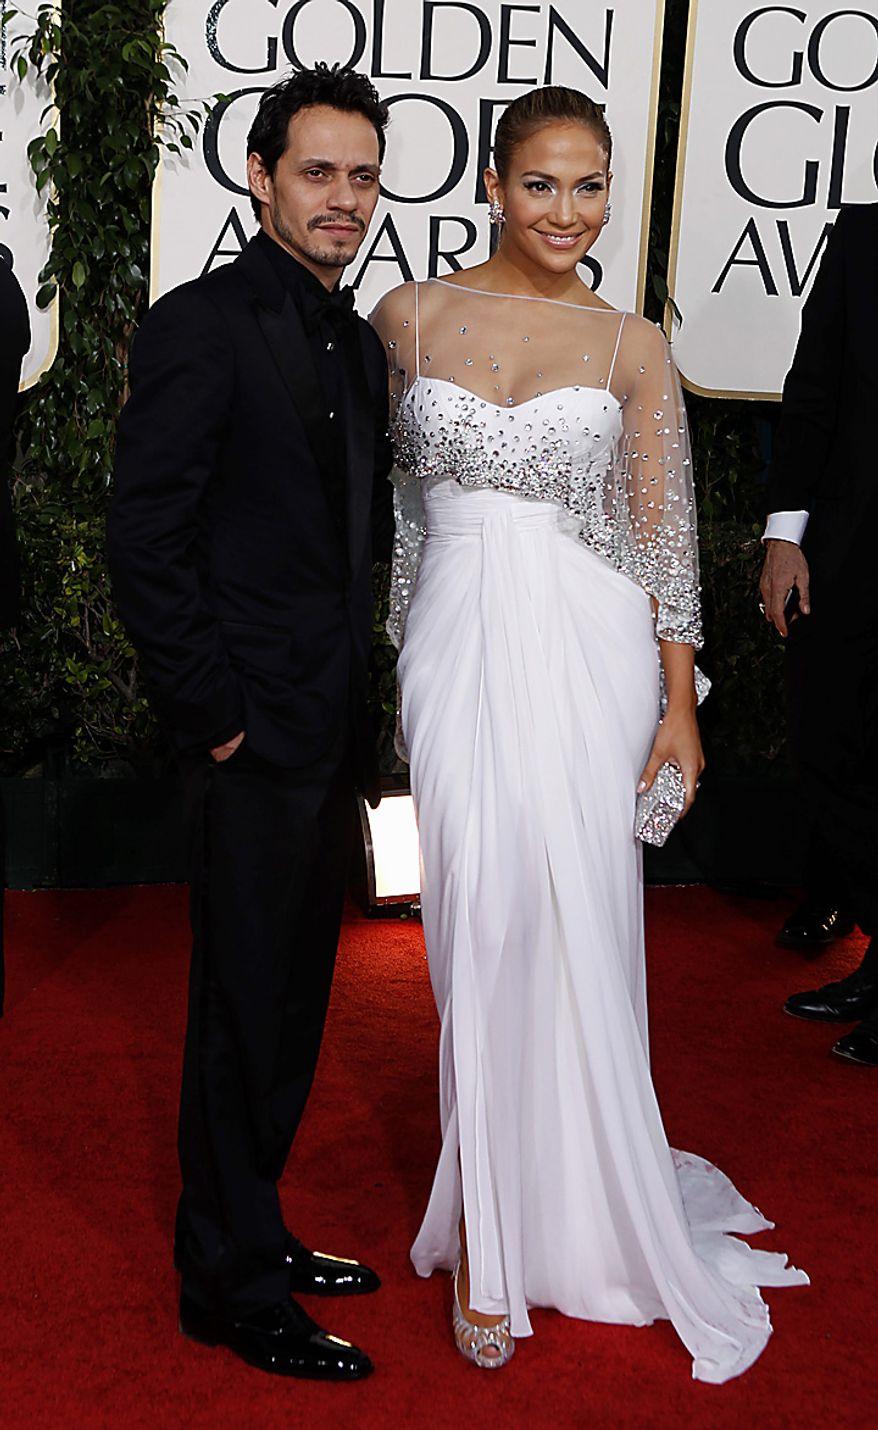 Jennifer Lopez arrives with her husband Marc Anthony, left, for the Golden Globe Awards Sunday, Jan. 16, 2011, in Beverly Hills, Calif. (AP Photo/Matt Sayles)